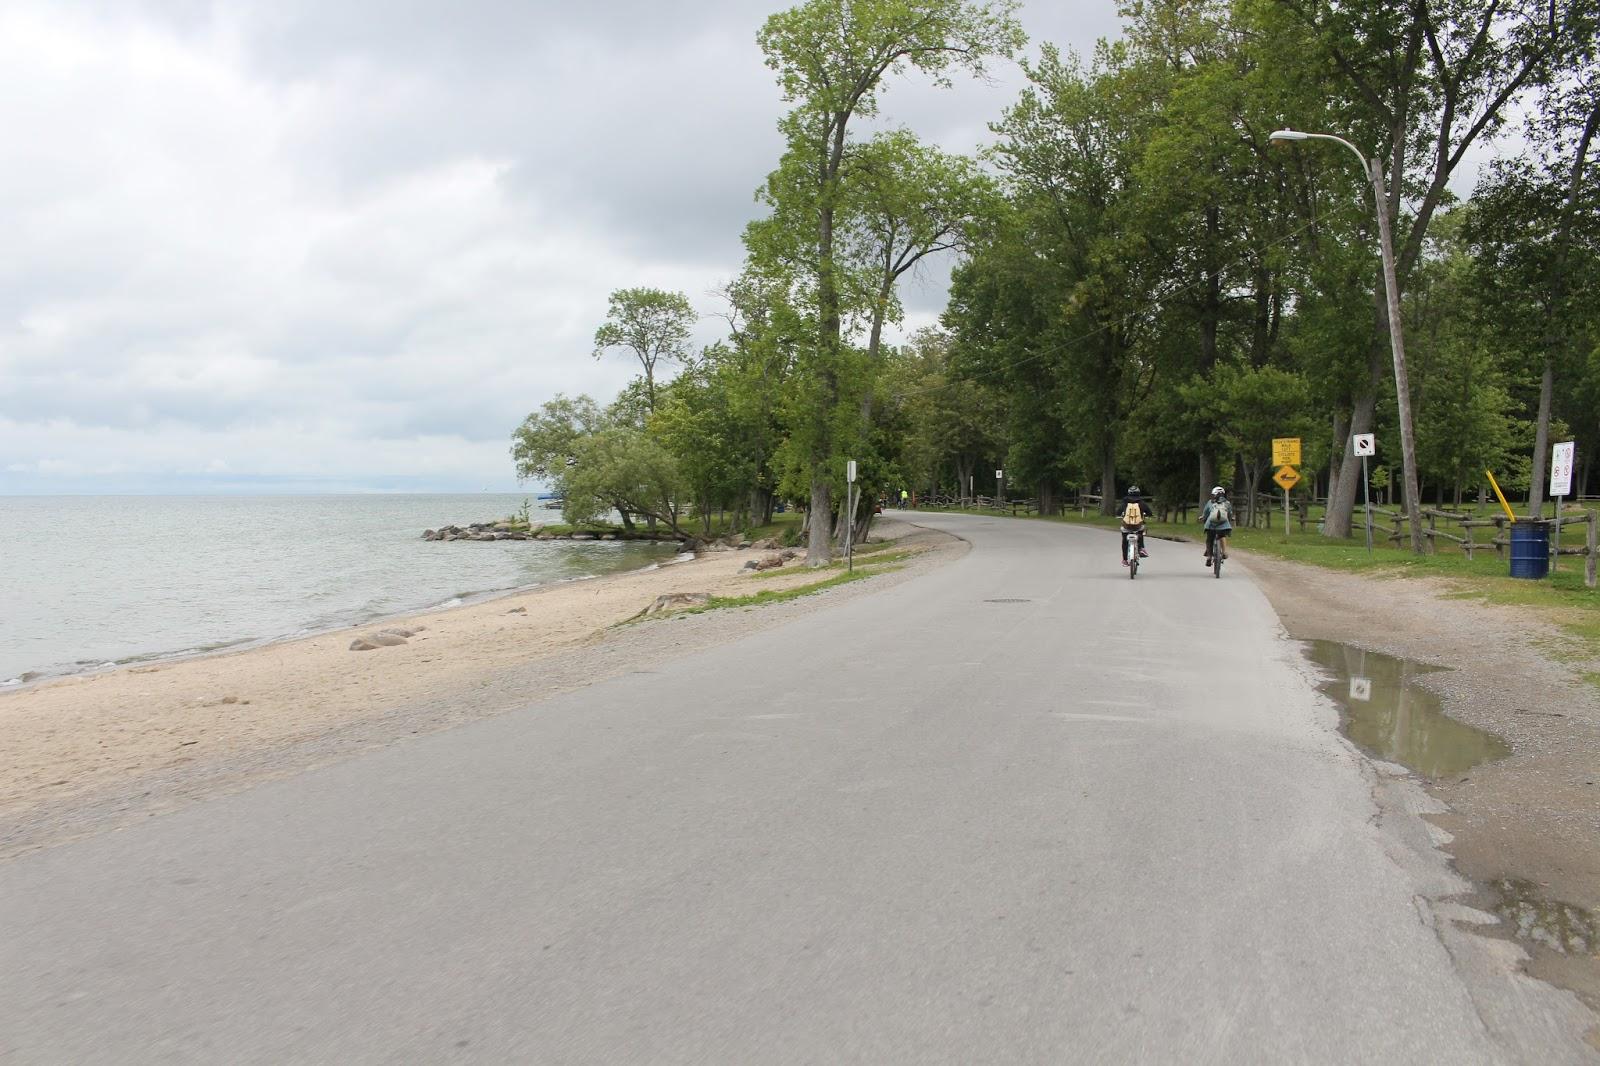 Willow Beach Ontario >> Shawn's Bicycle Adventures: Lake Simcoe Shoreline in Georgina